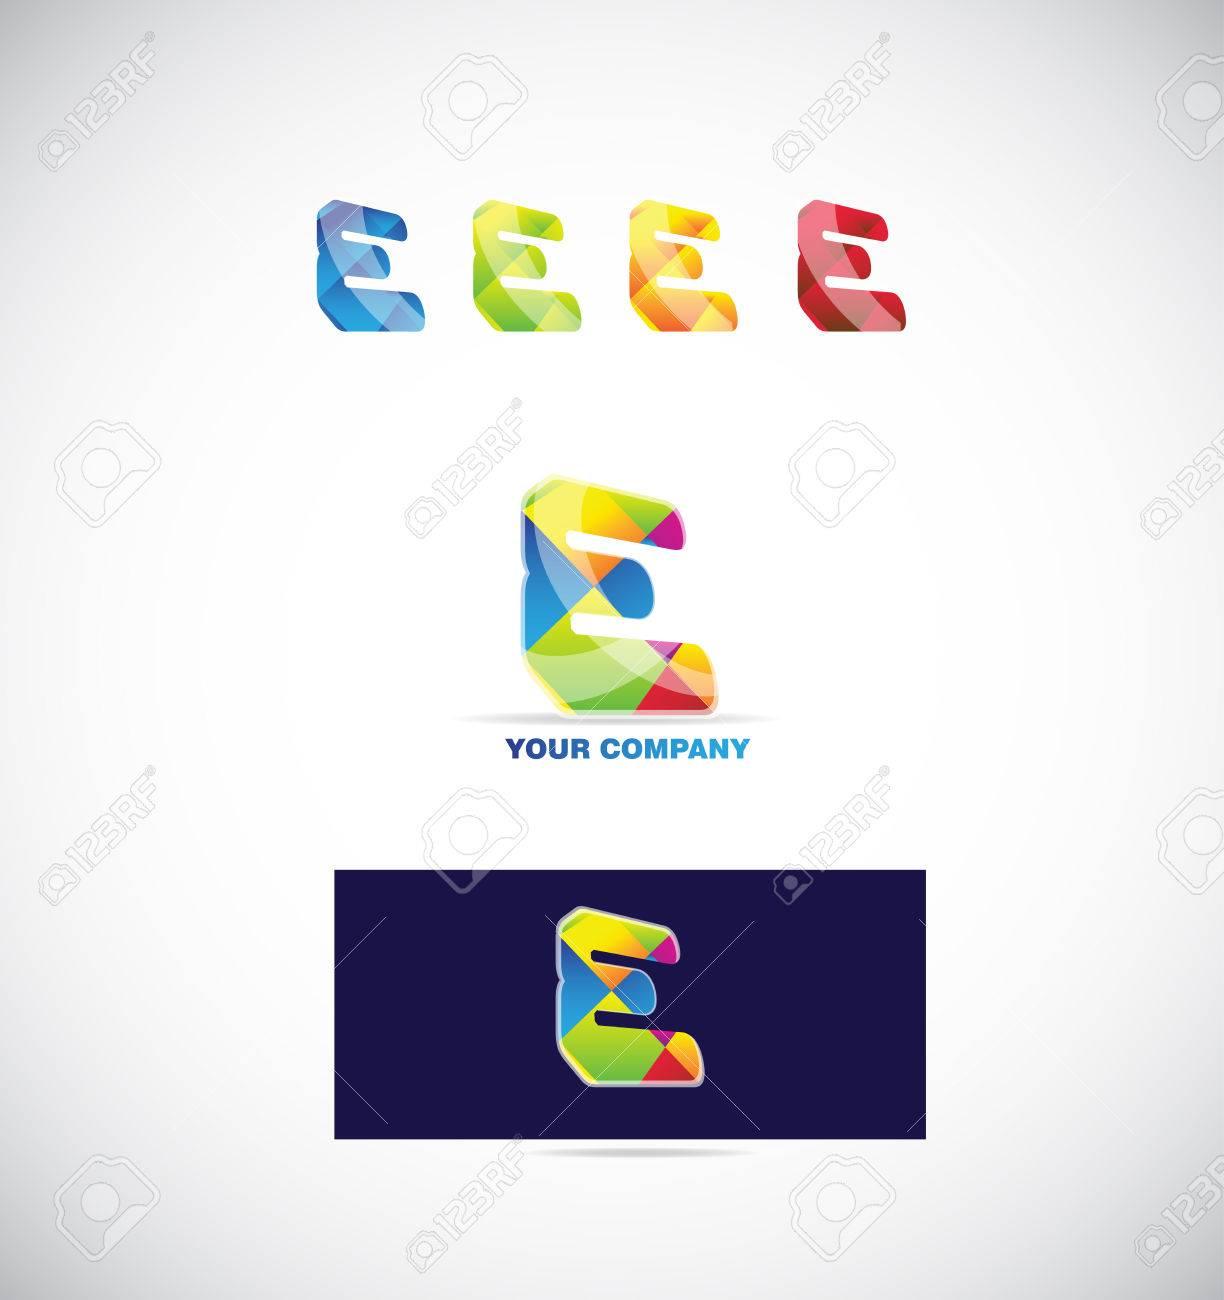 Company logo icon element template alphabet letter e colors royalty company logo icon element template alphabet letter e colors stock vector 53335825 spiritdancerdesigns Choice Image